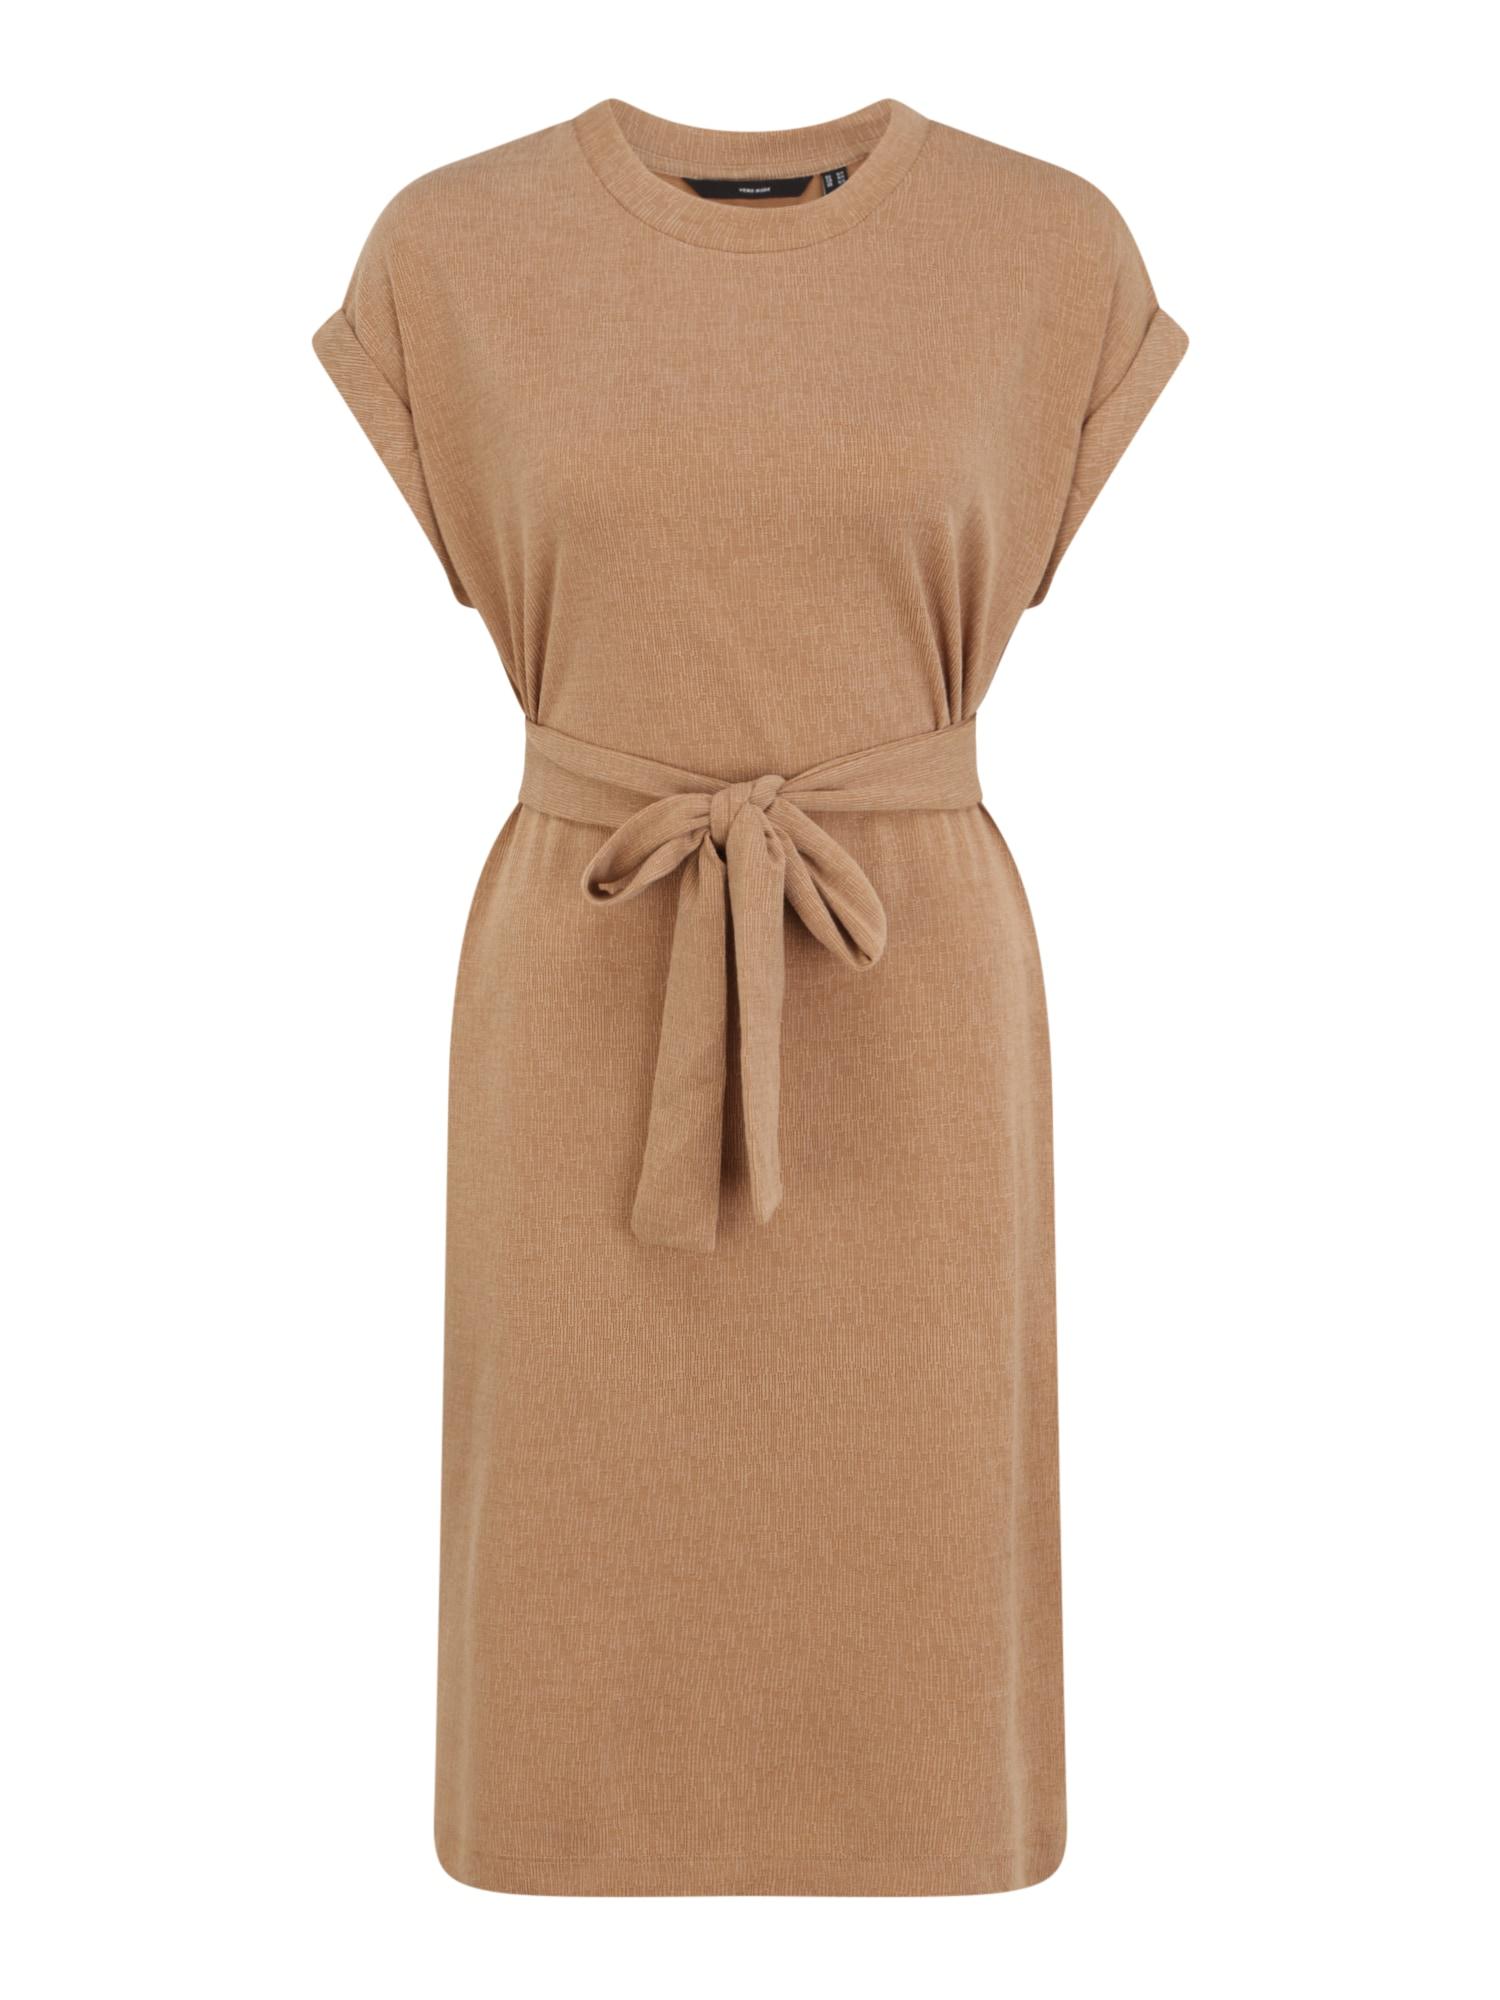 Vero Moda Tall Šaty 'KIARA'  světle hnědá / starobéžová